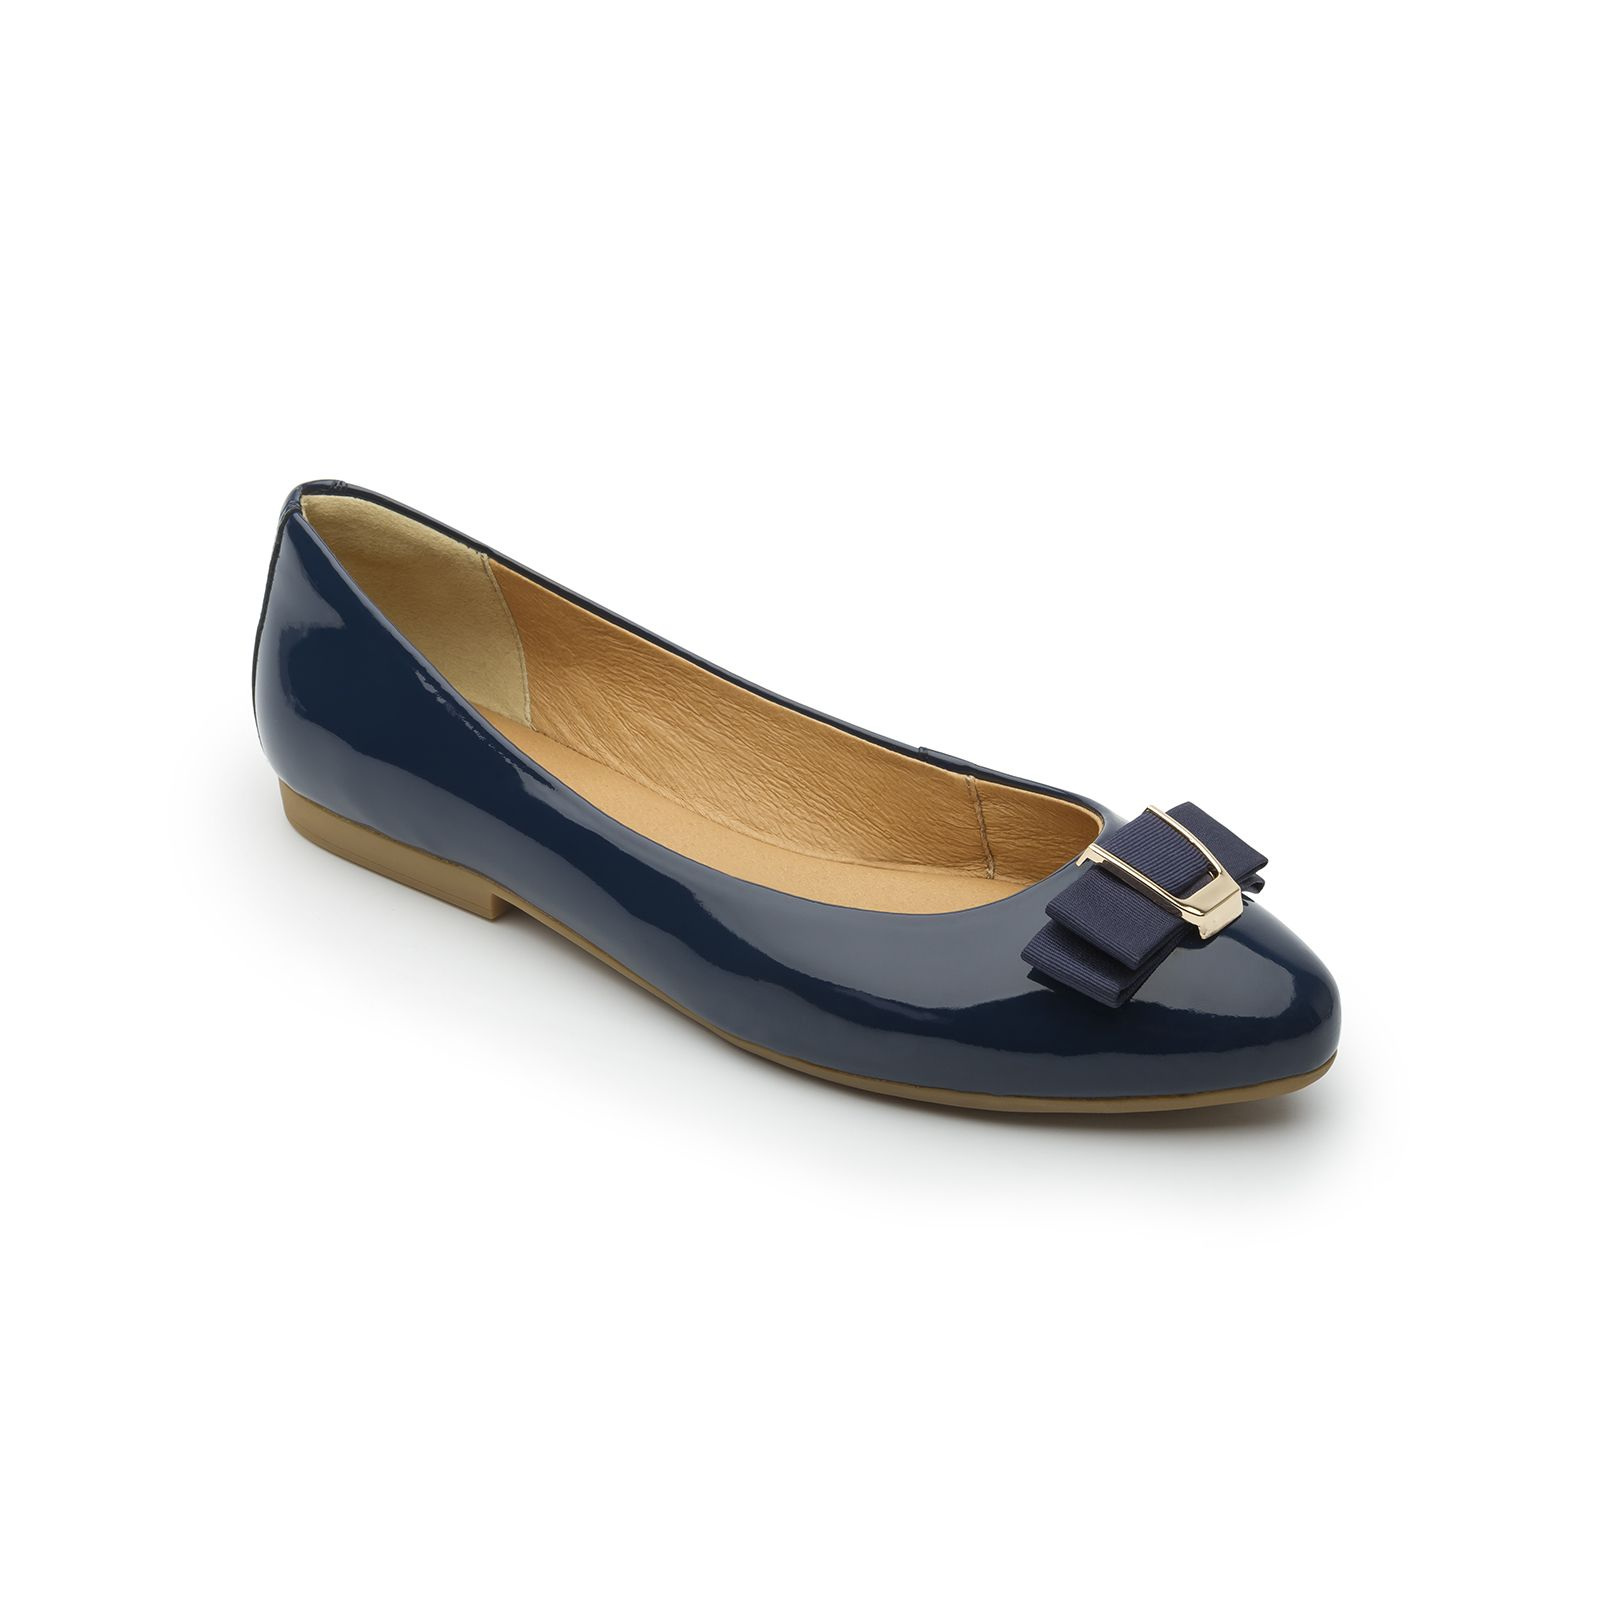 b285ee2c MODELOS DE ZAPATOS FLEXI PARA DAMA 2018 #flexi #modelos #modelosdezapatos # zapatos